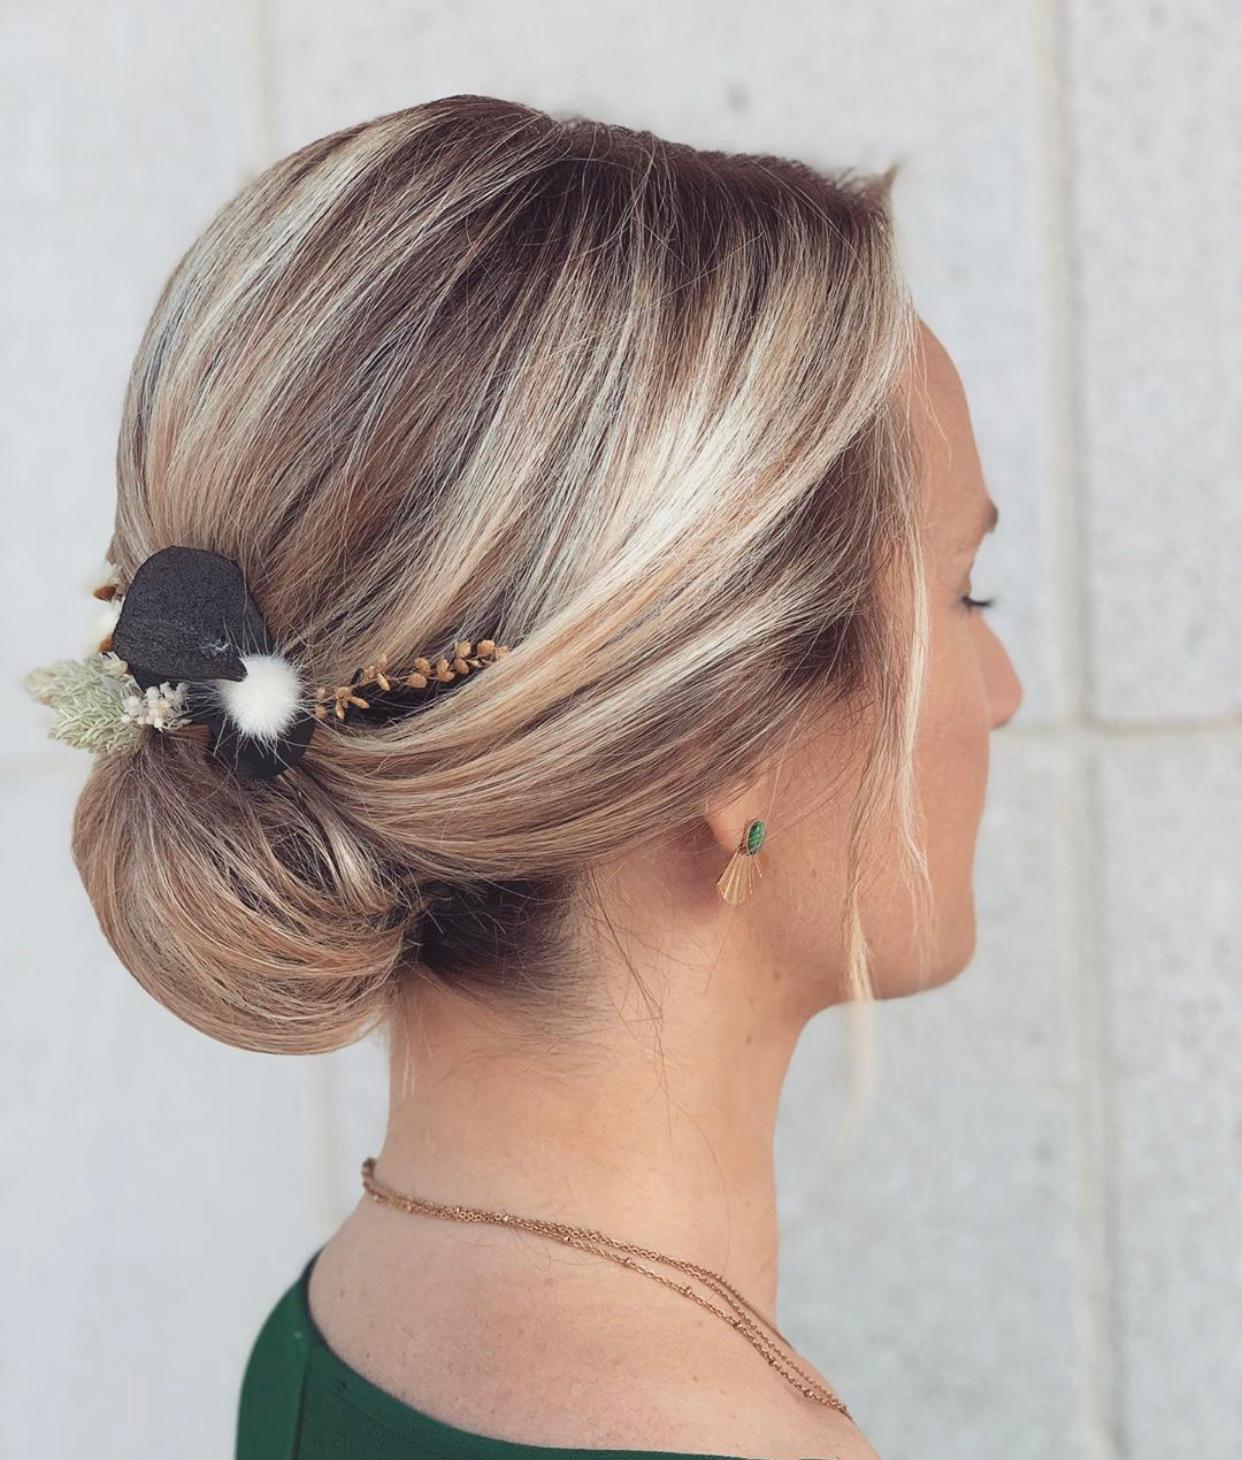 aml-nantes-emmanuelle-coiffure-lissage-04-31